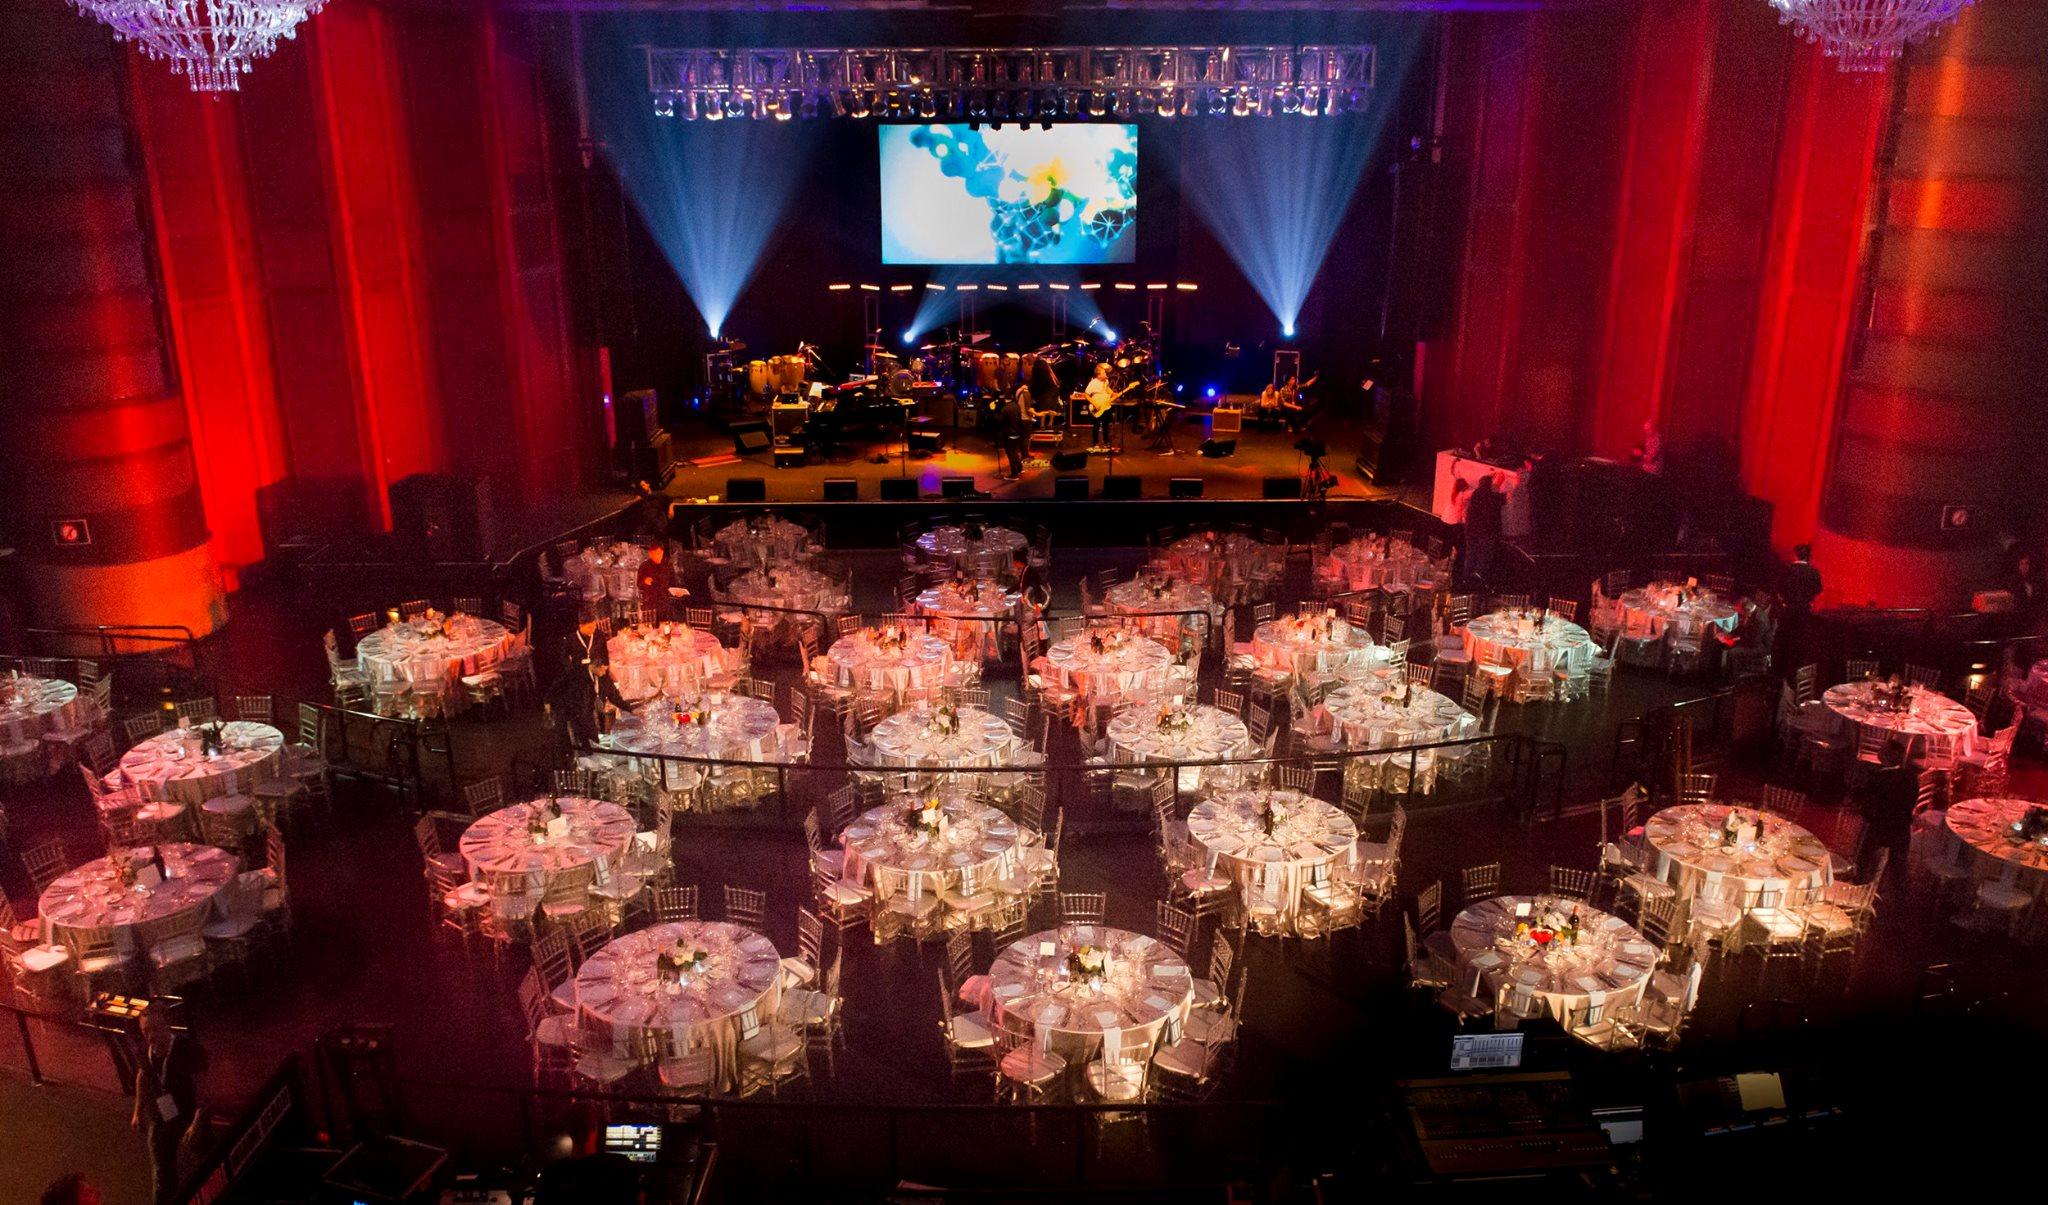 Phil & Orianne Collins' Little Dreams Foundation Benefit Gala. Photo: Magical Photos